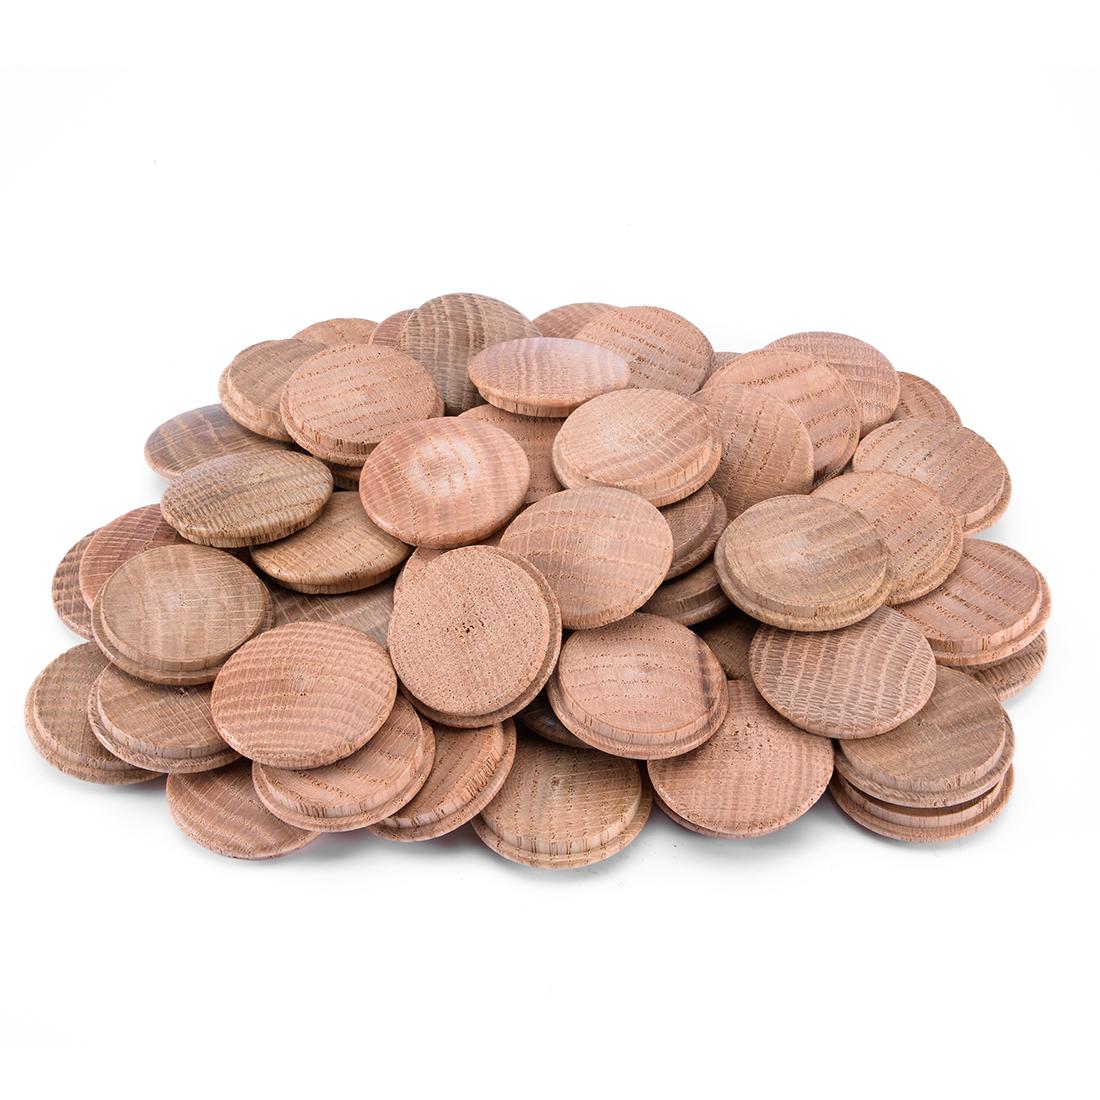 1-3/8-Inch Oak Button Top Wood Plugs 60 Pcs